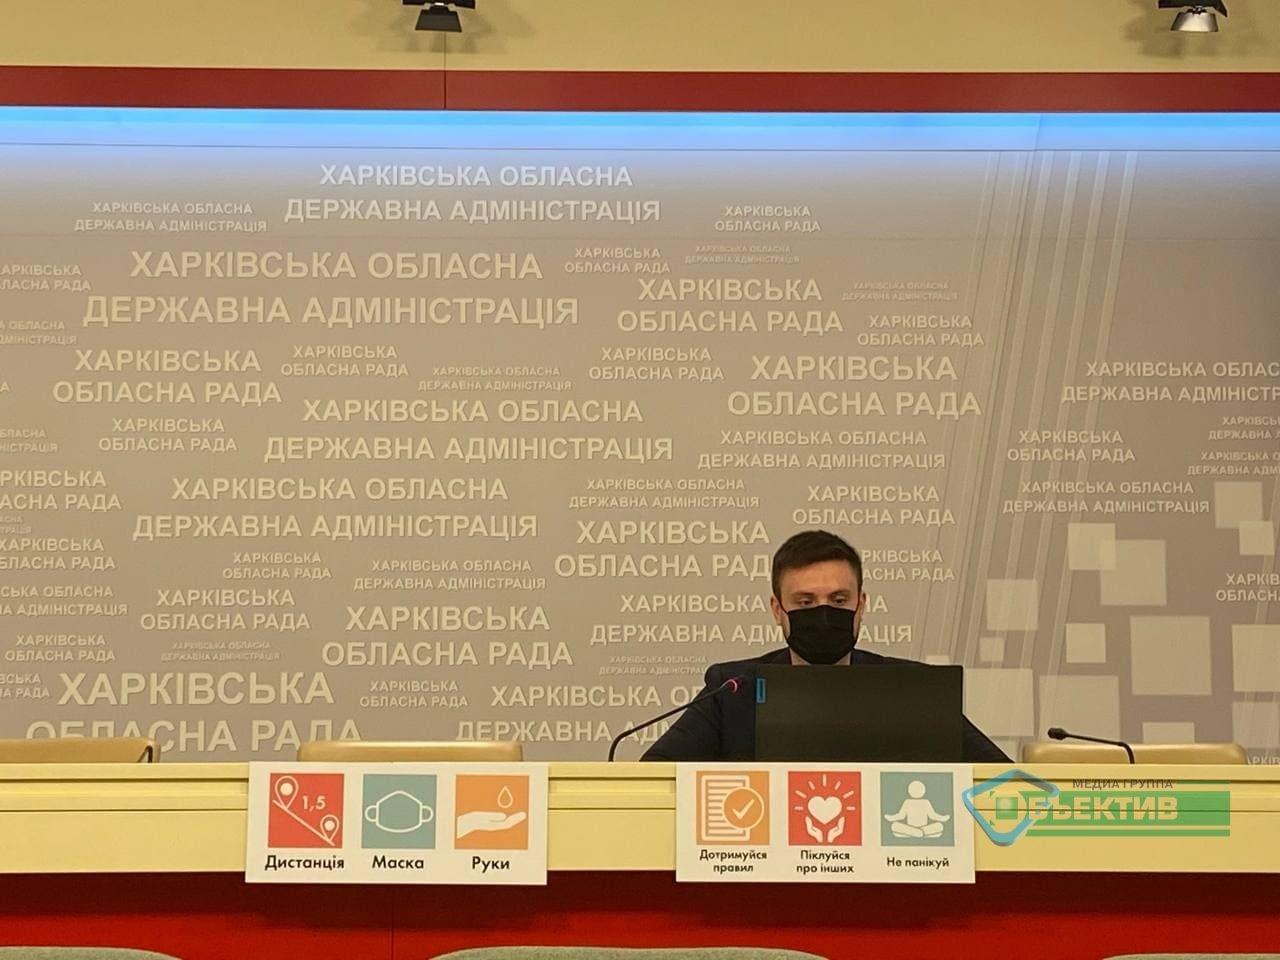 В 21 громаде на Харьковщине нет центров админуслуг